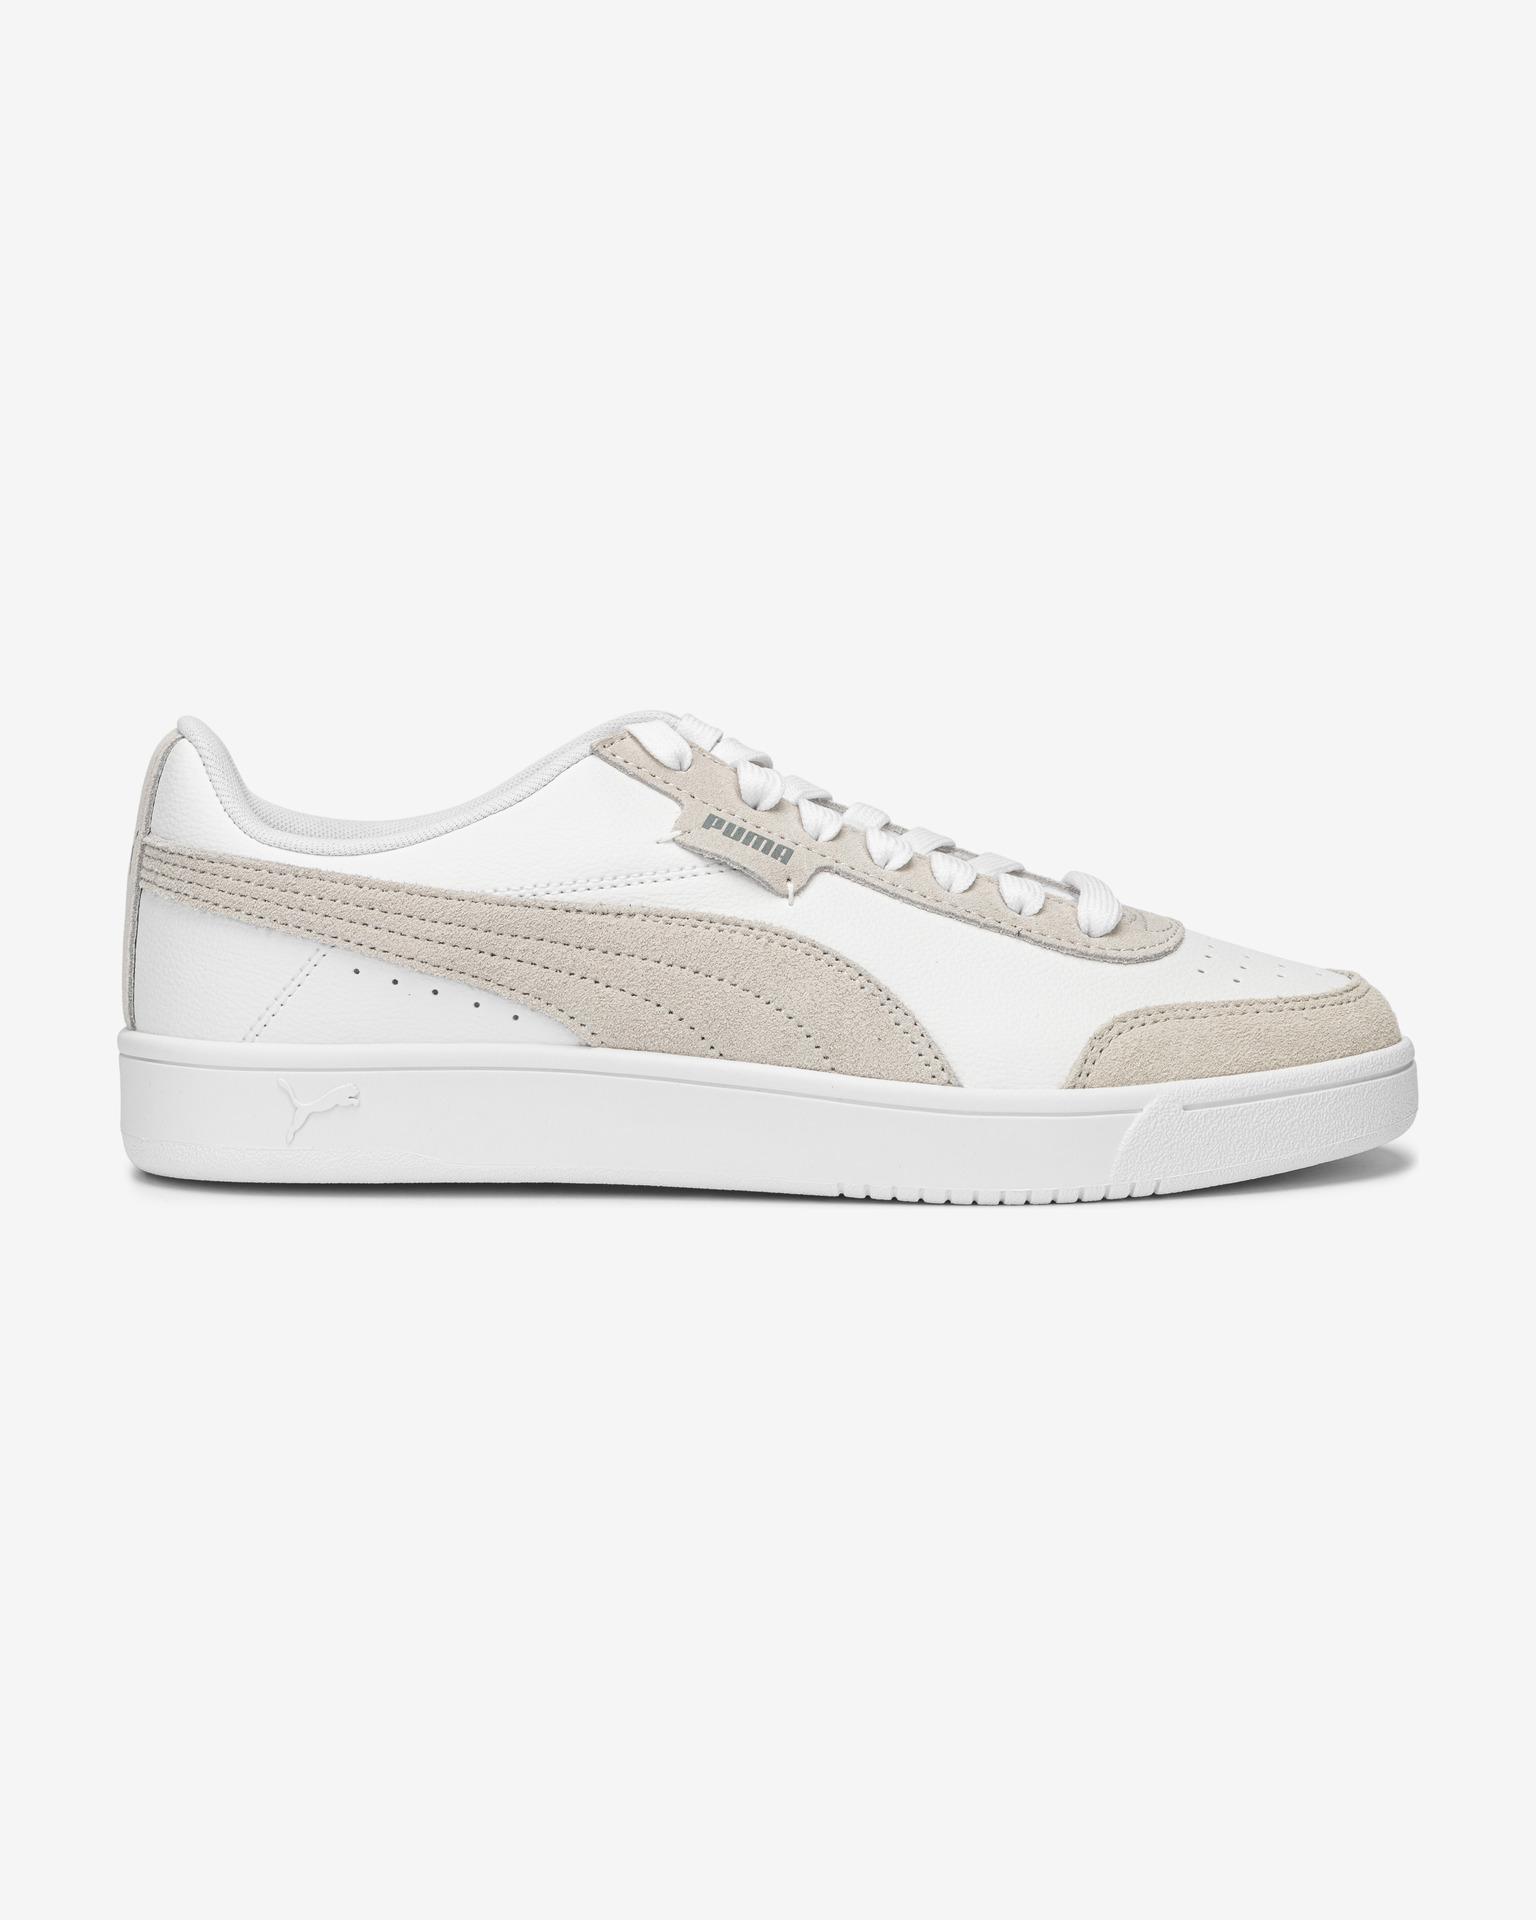 Puma - Court Legend Lo Sneakers Bibloo.com